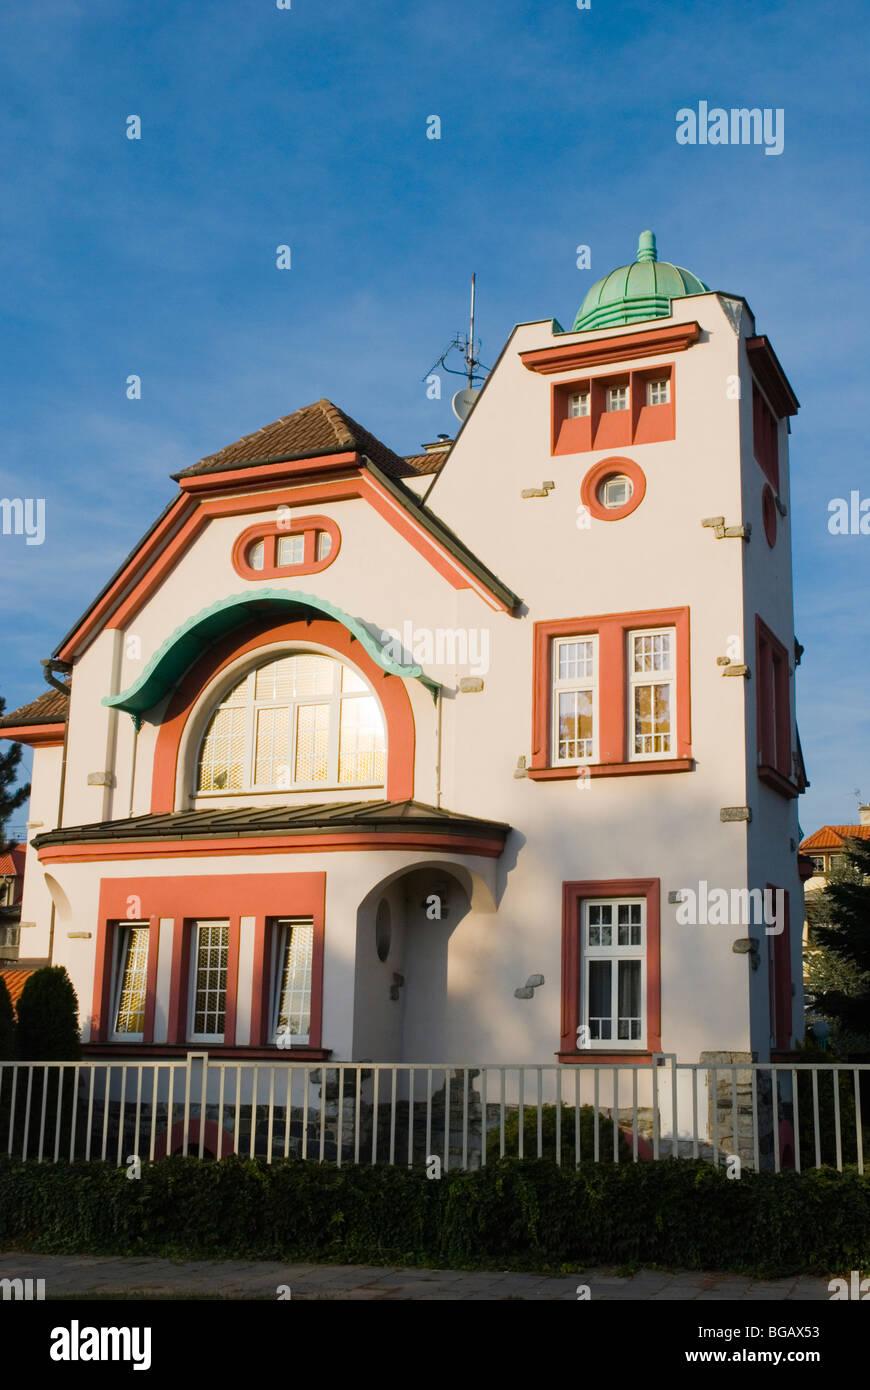 Domestic house Olomouc Czech Republic Europe - Stock Image